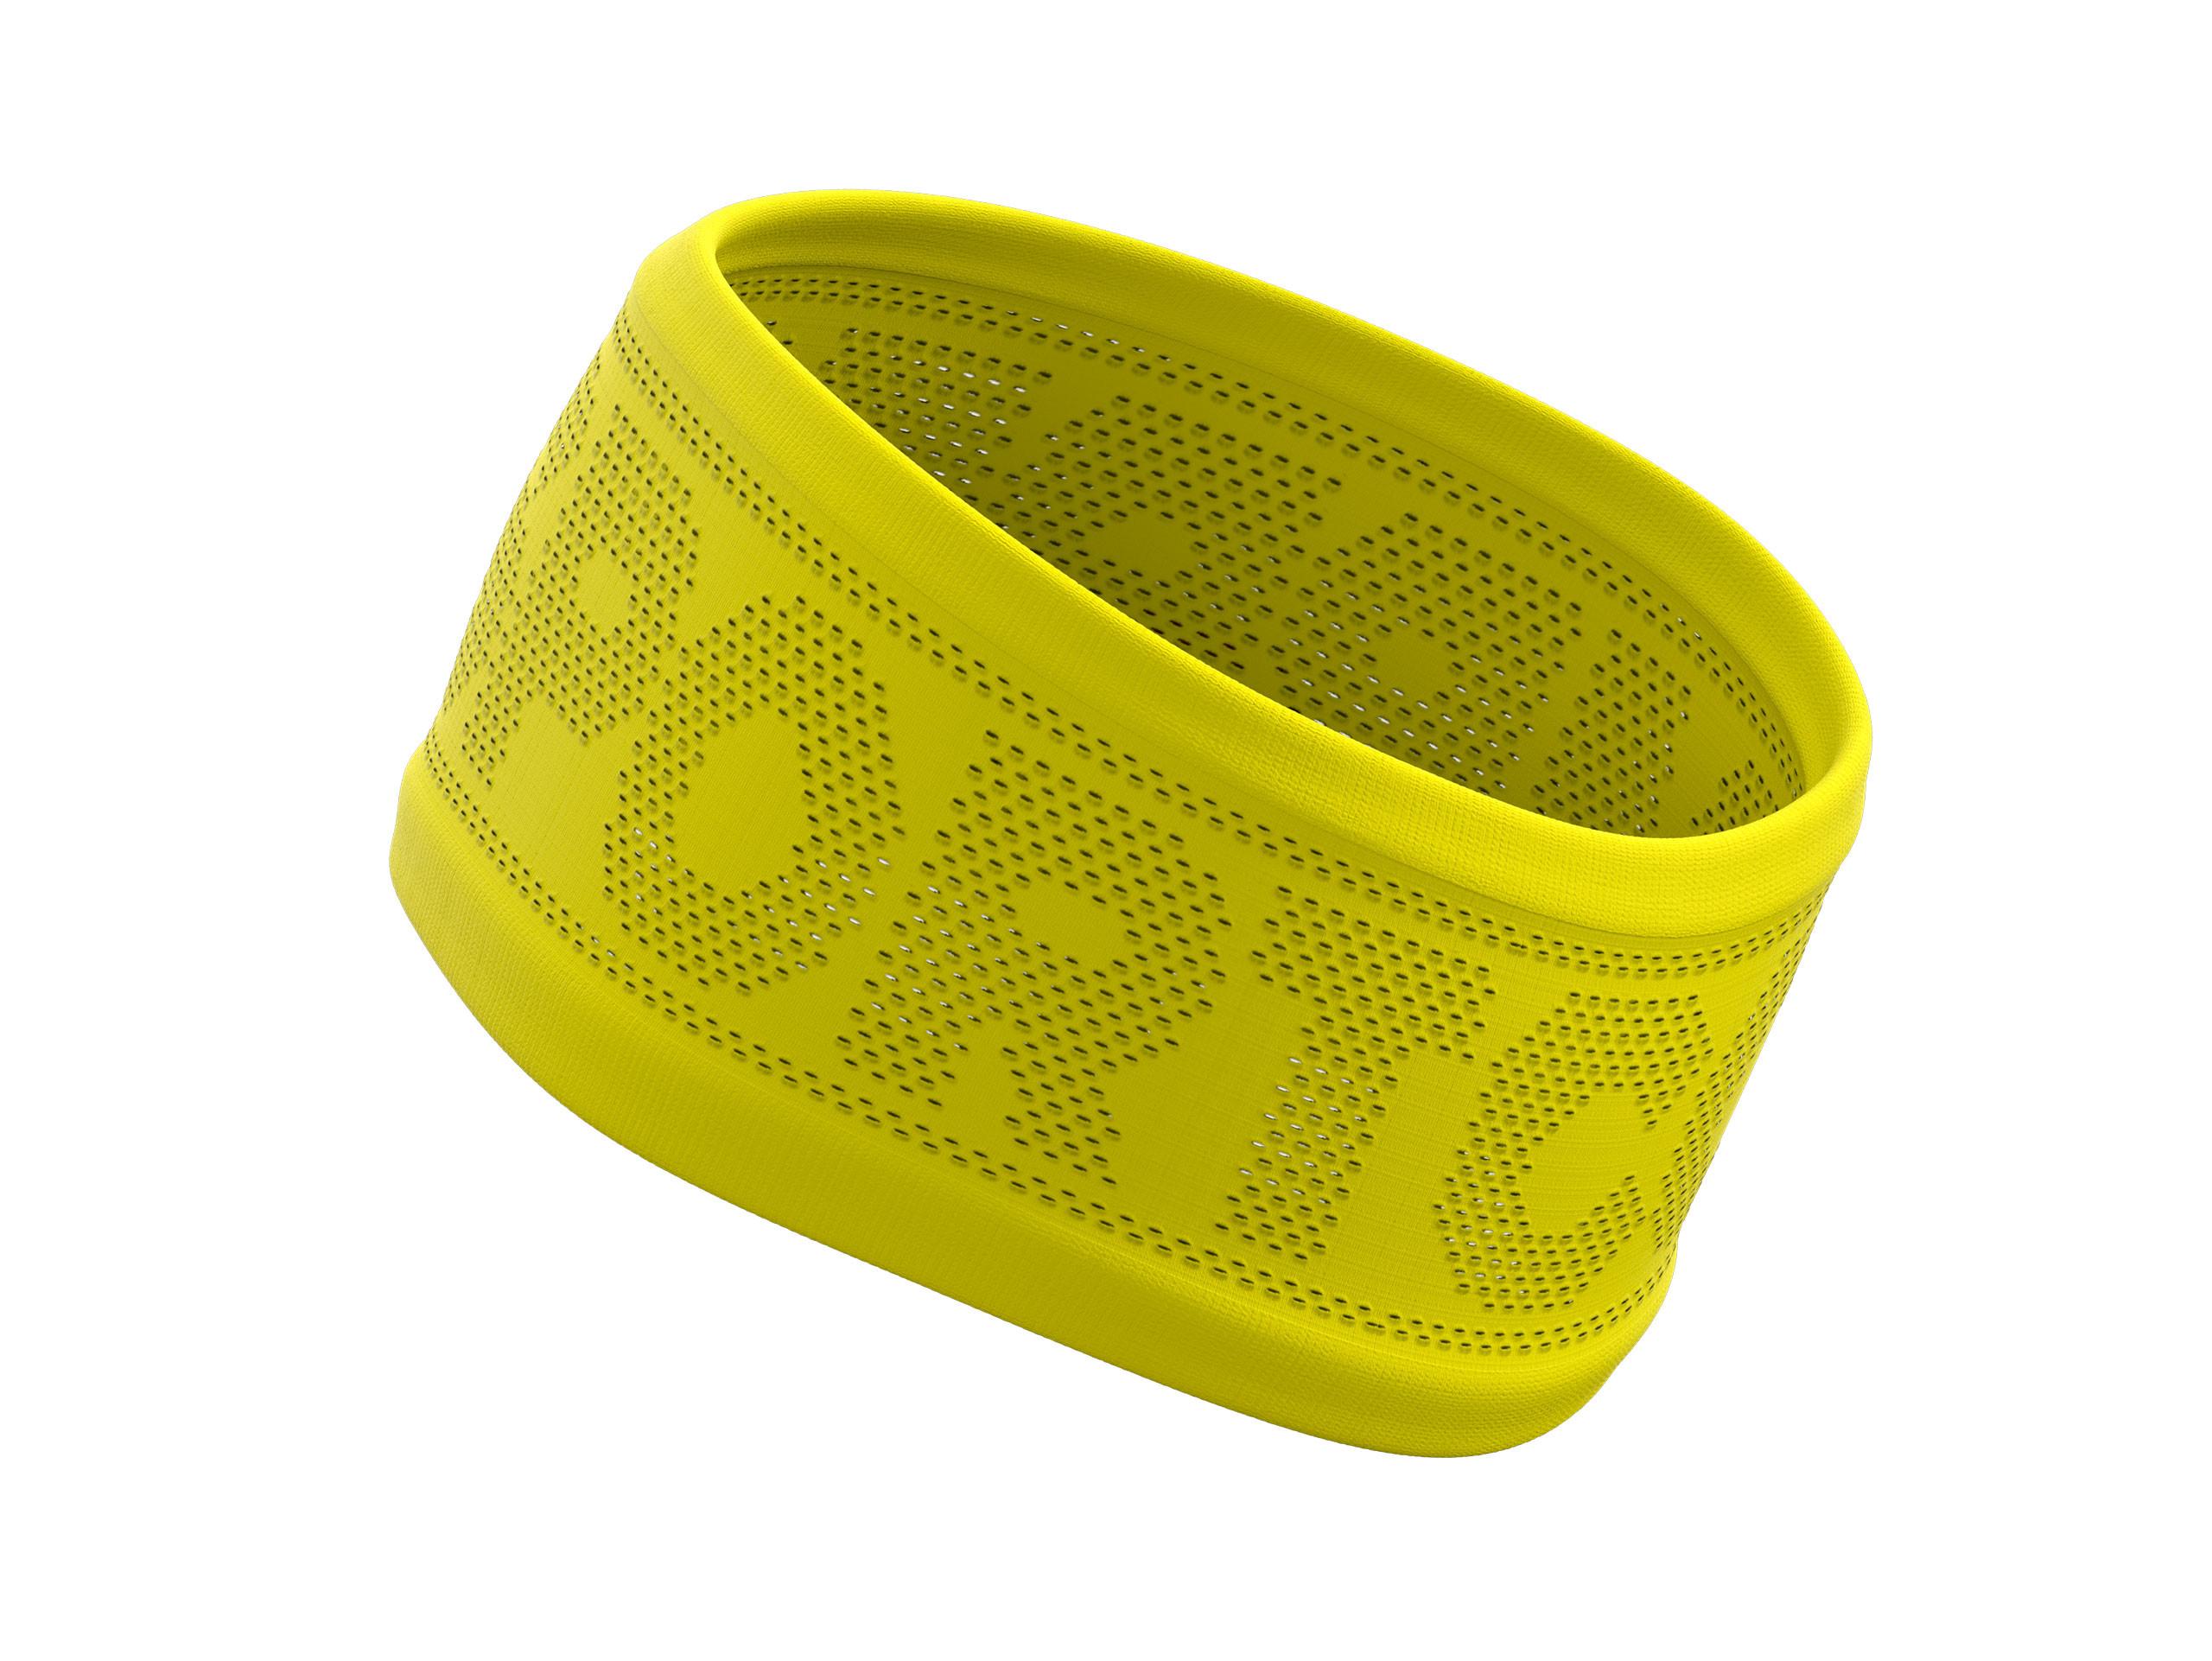 HeadBand On/Off yellow